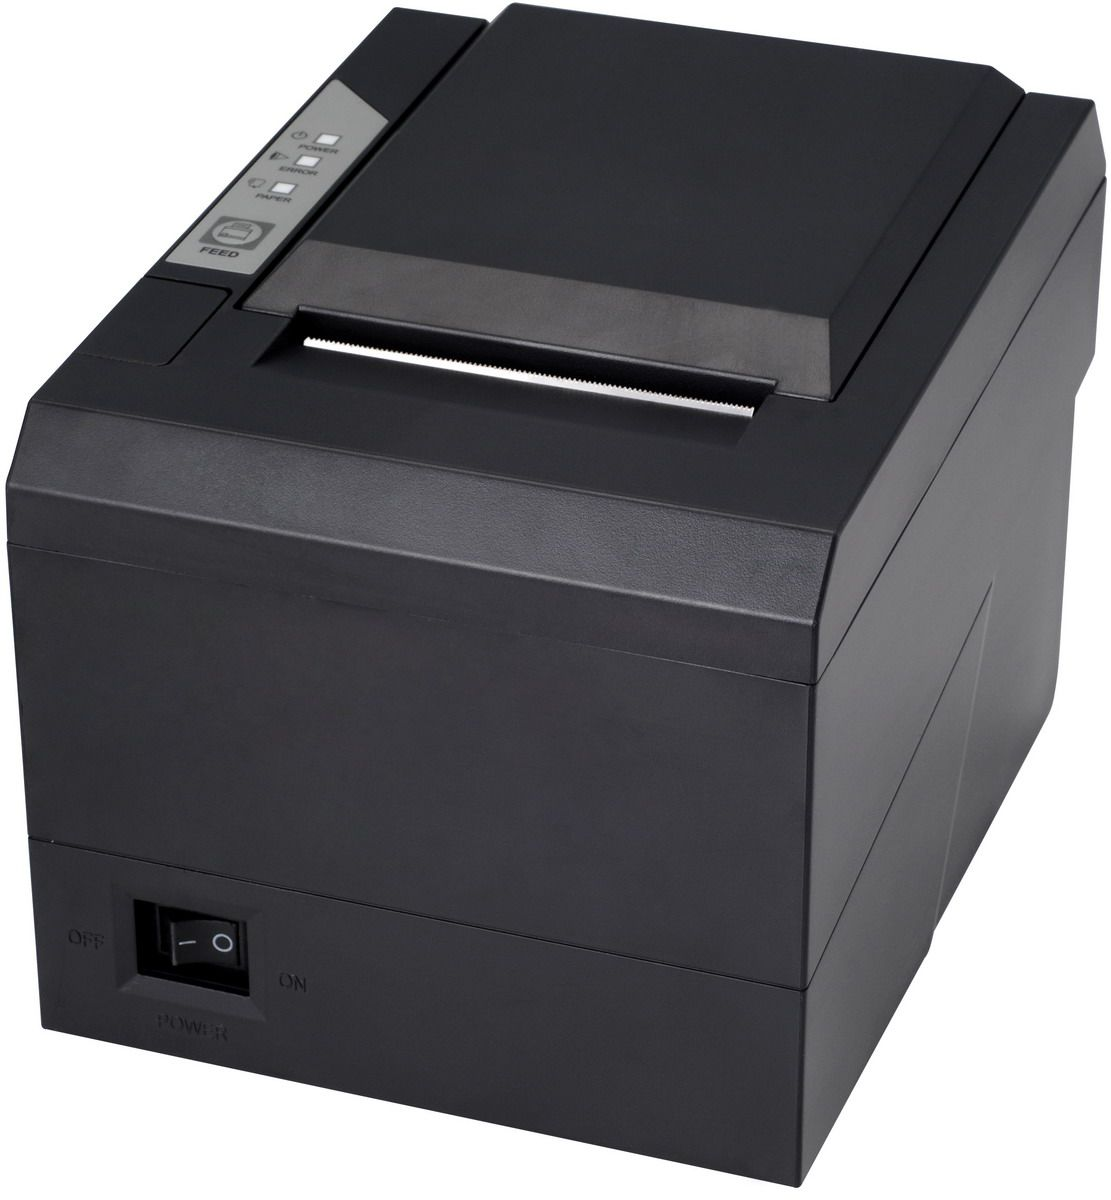 Impressora Térmica 80mm - OT550 USB + Leitor Laser